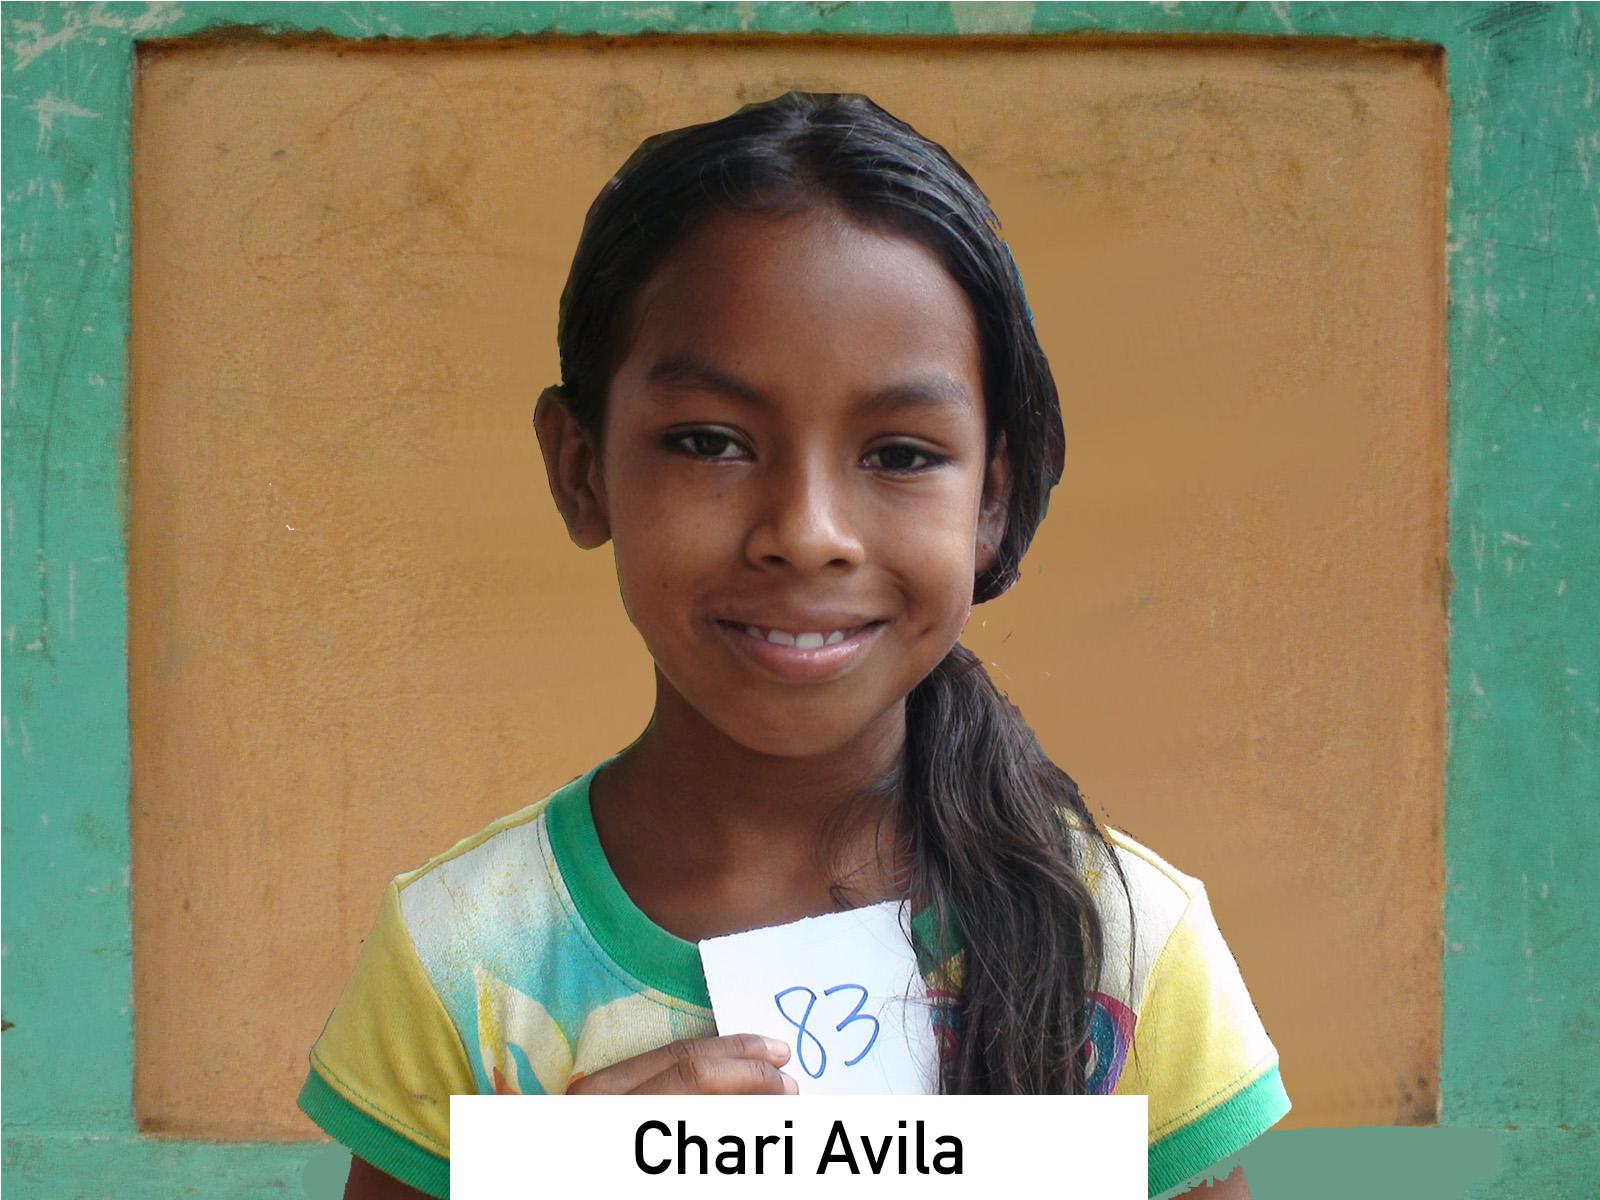 083 - Chari Avila.jpg